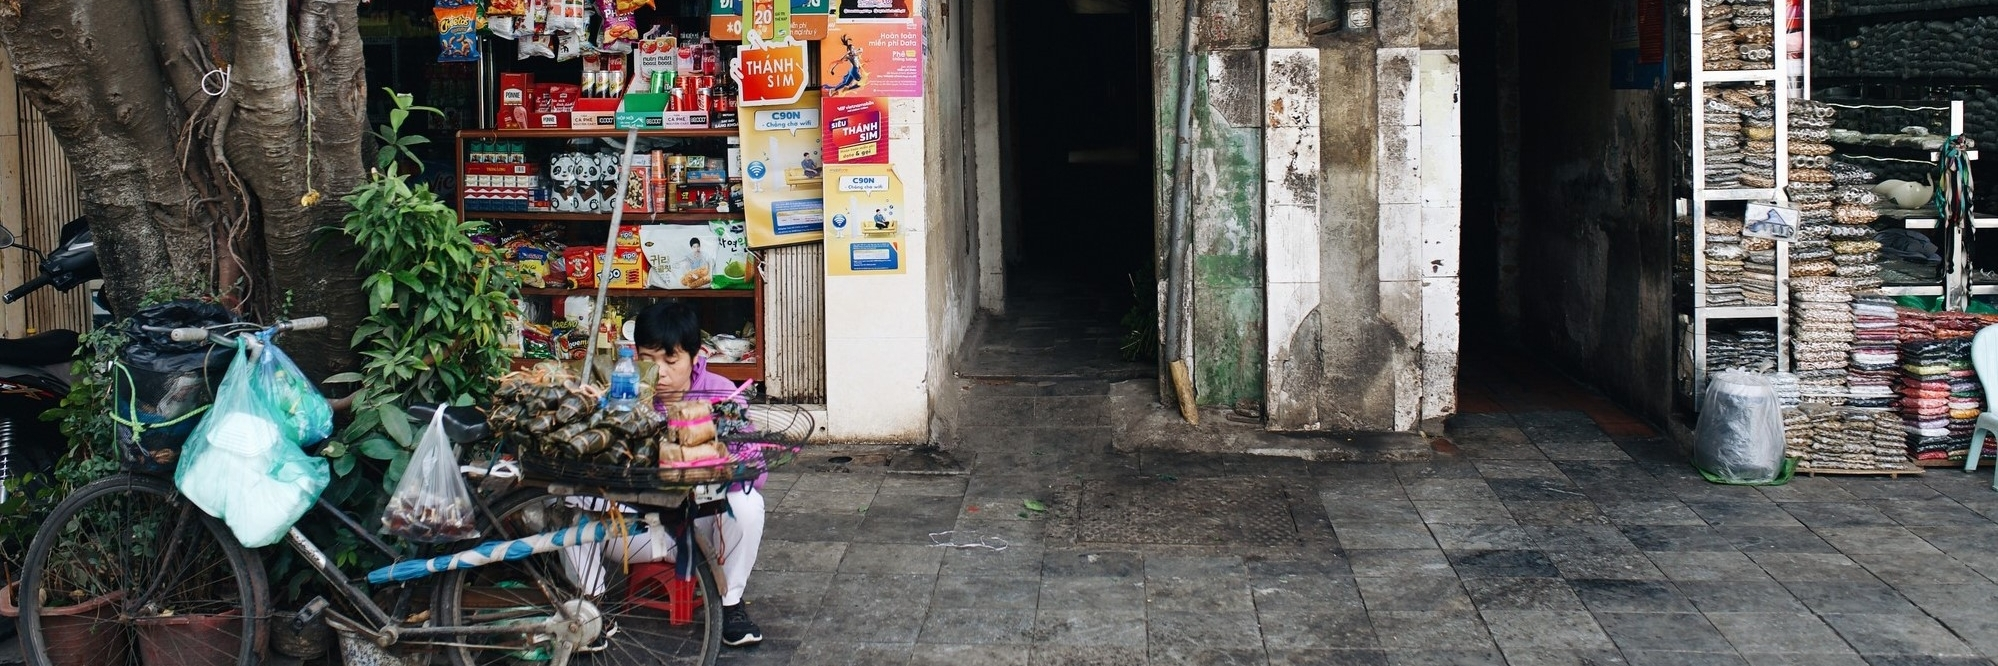 https://gody.vn/blog/nhu.bach7672/post/mua-dong-ha-noi-nhung-ngay-dong-yeu-dau-va-dep-den-nao-long-nguoi-2531